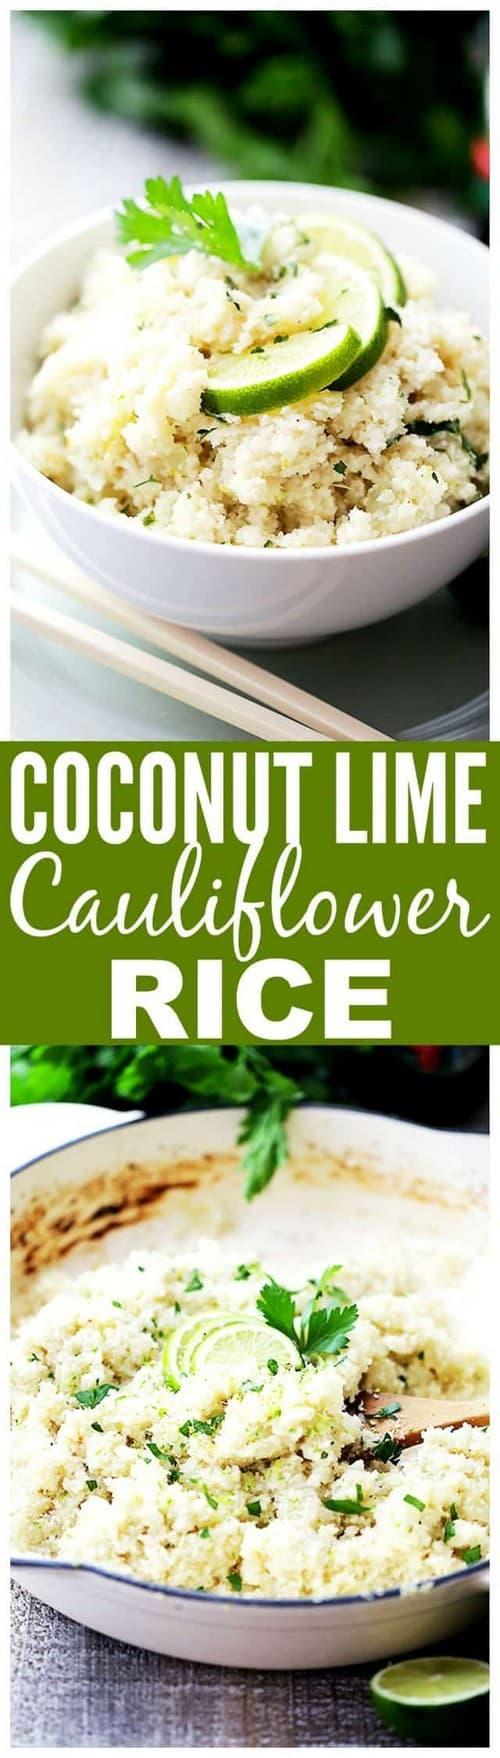 coconut-lime-cauliflower-rice